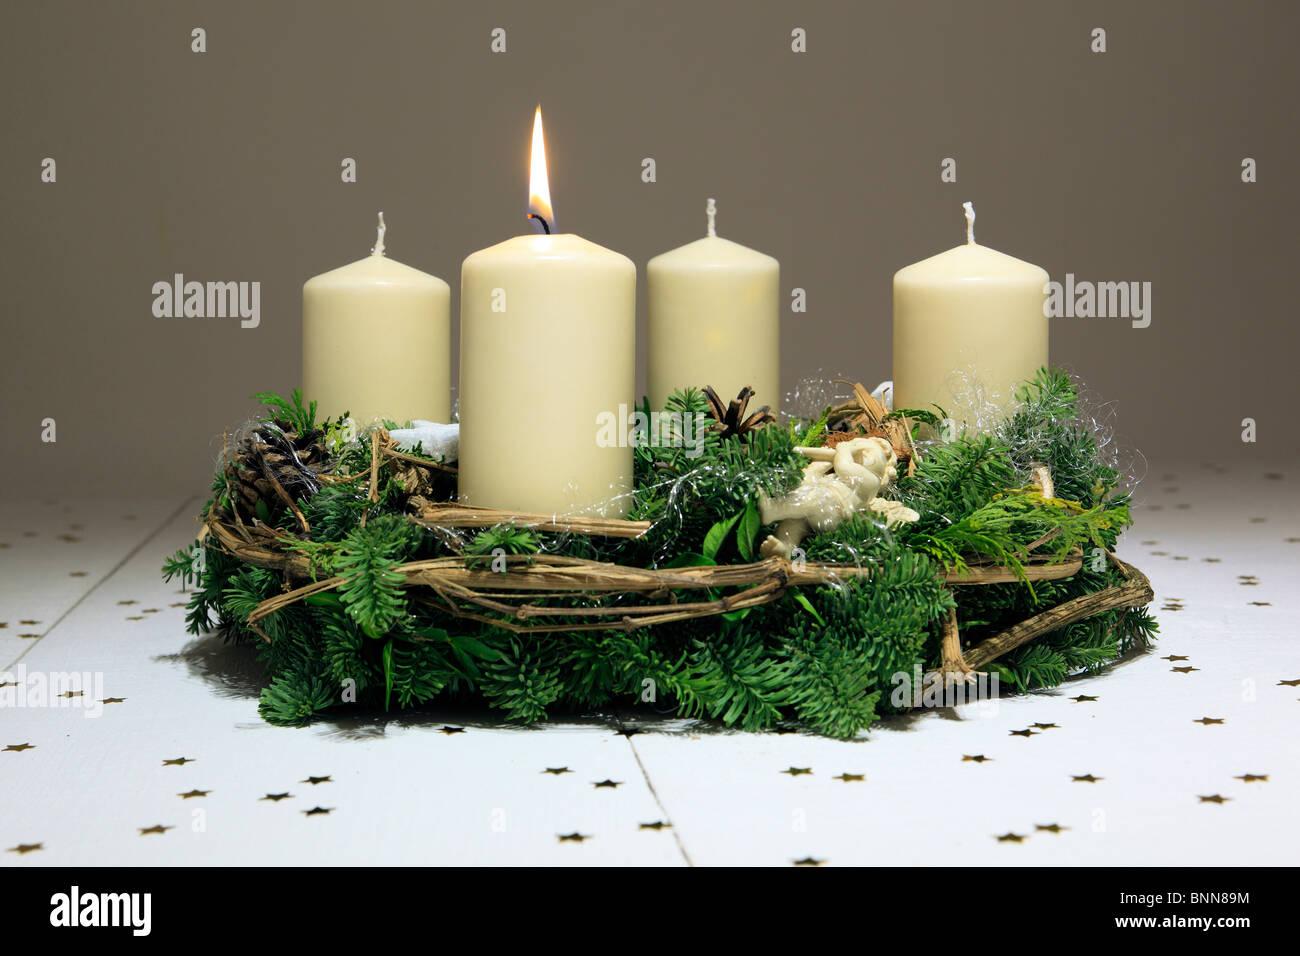 1 4 advent advent wreath advent time deko decoration. Black Bedroom Furniture Sets. Home Design Ideas